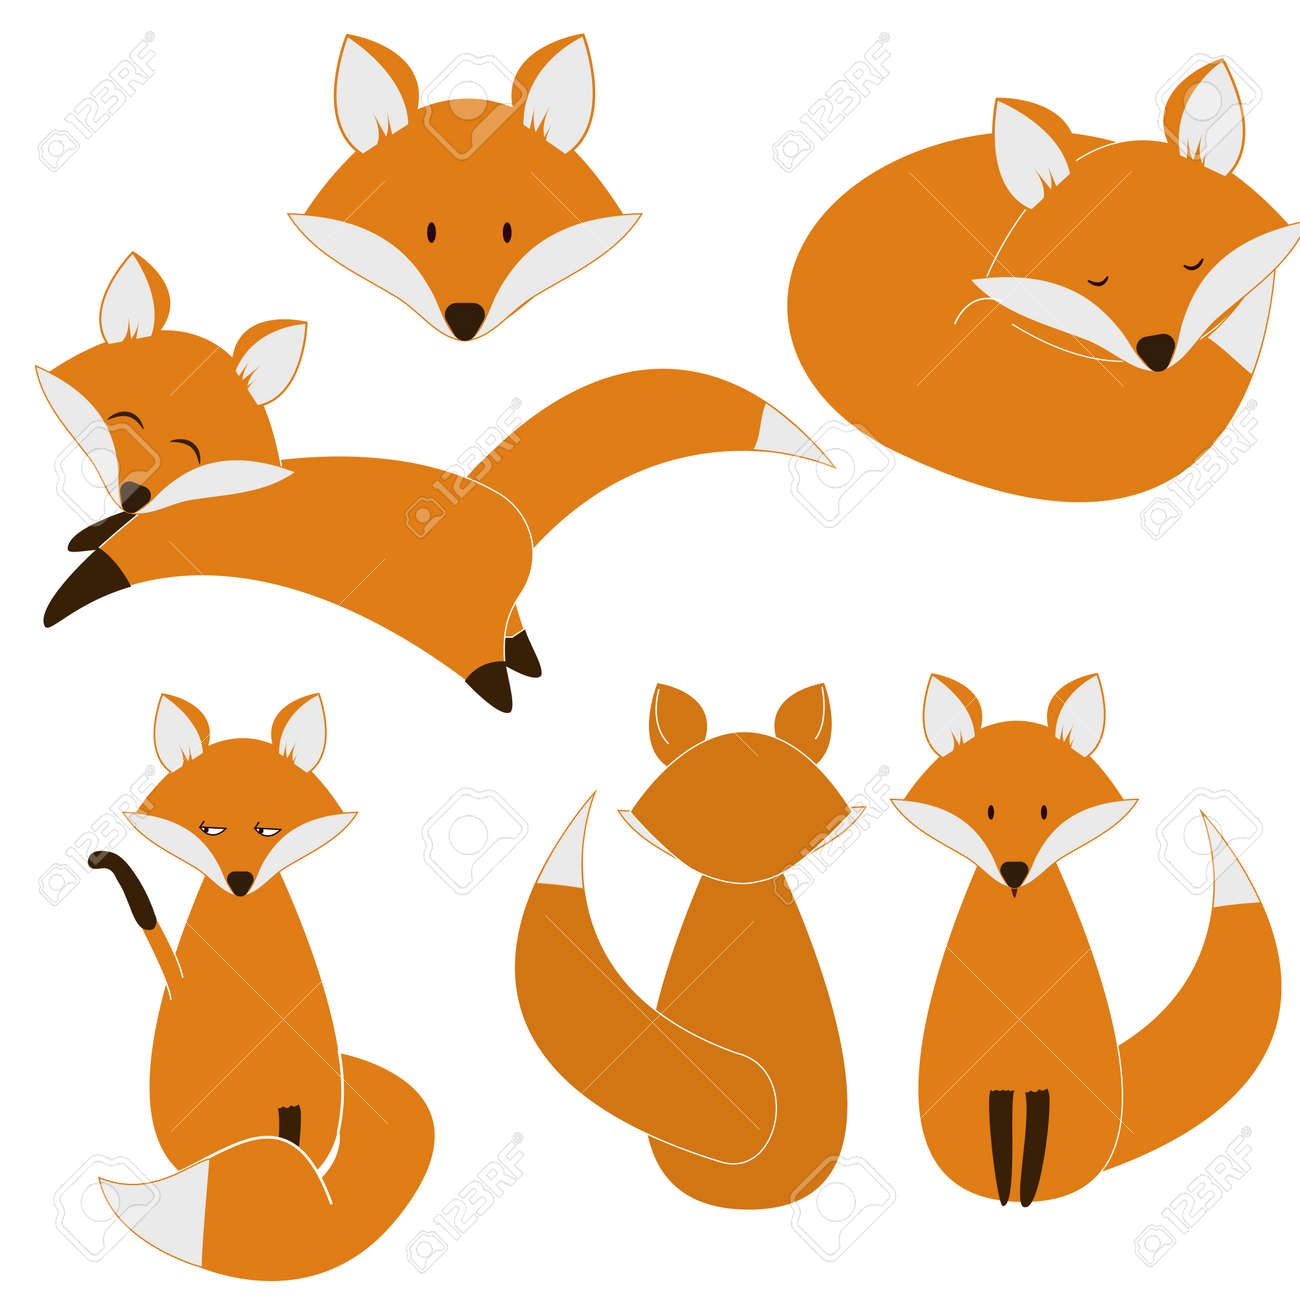 Foxes vector set - 28279856